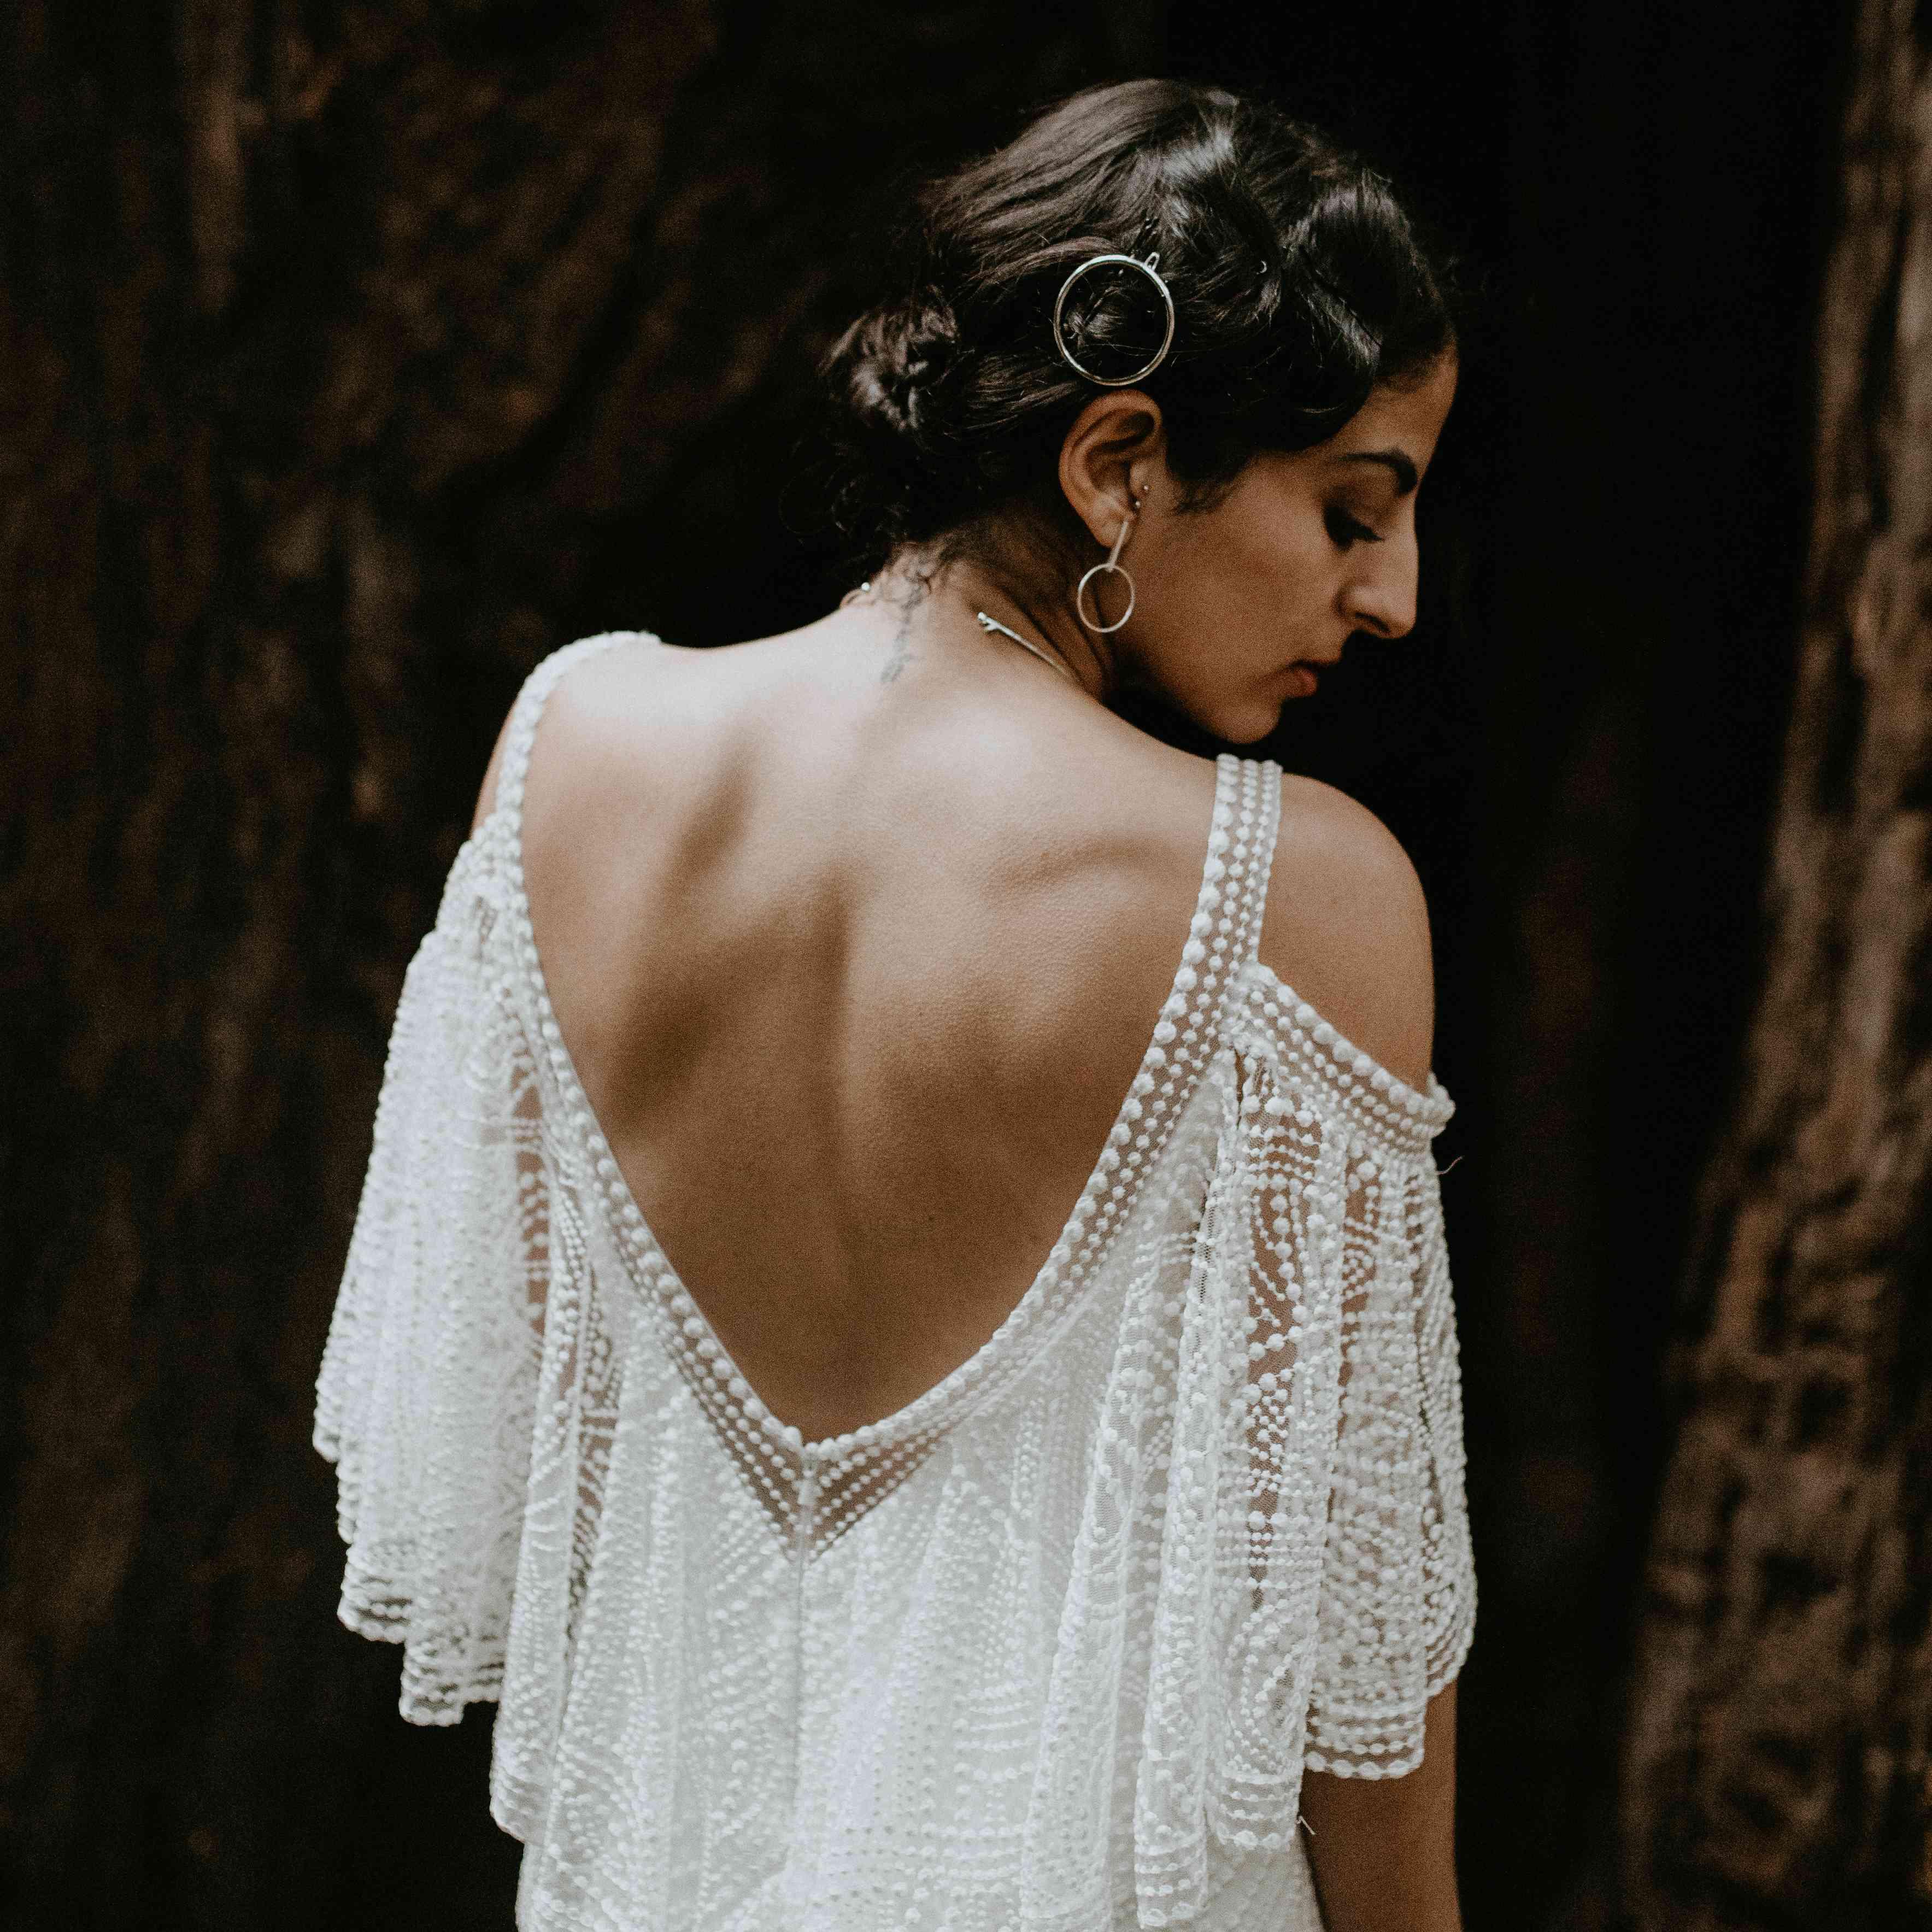 <p>low back tadashi shoji wedding dress</p><br><br>